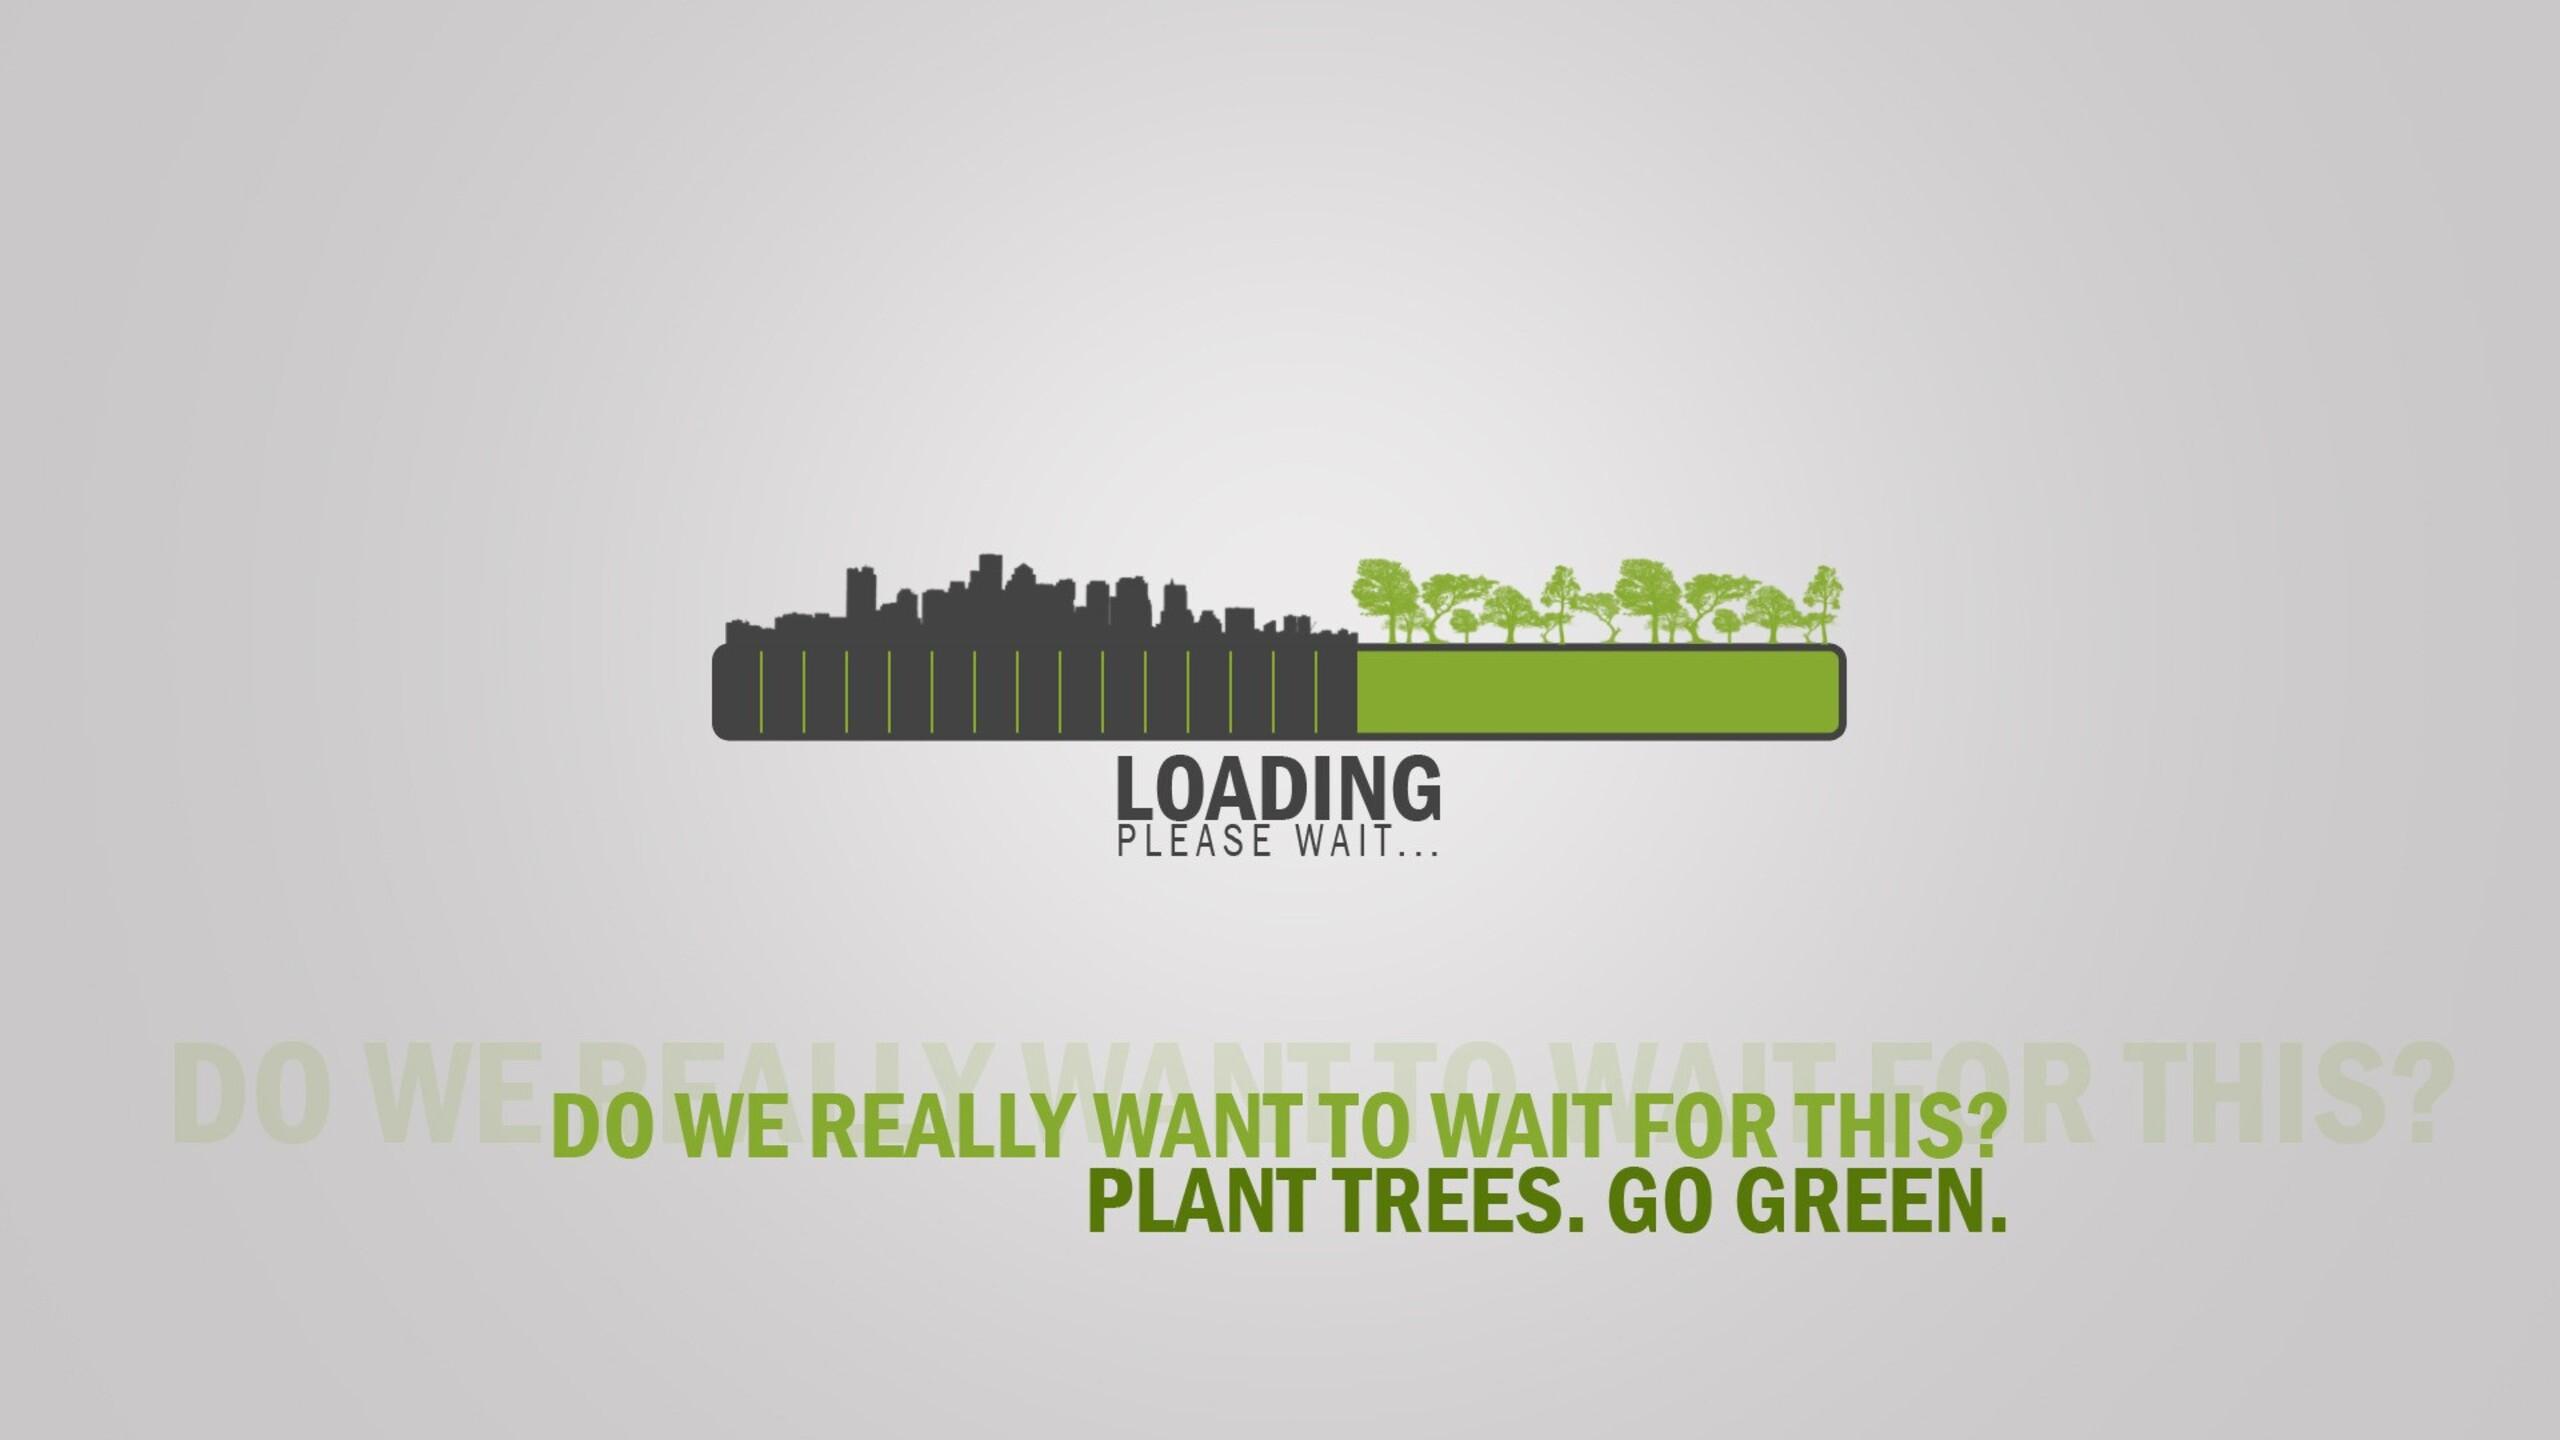 go-green-inspirational-typography-image.jpg